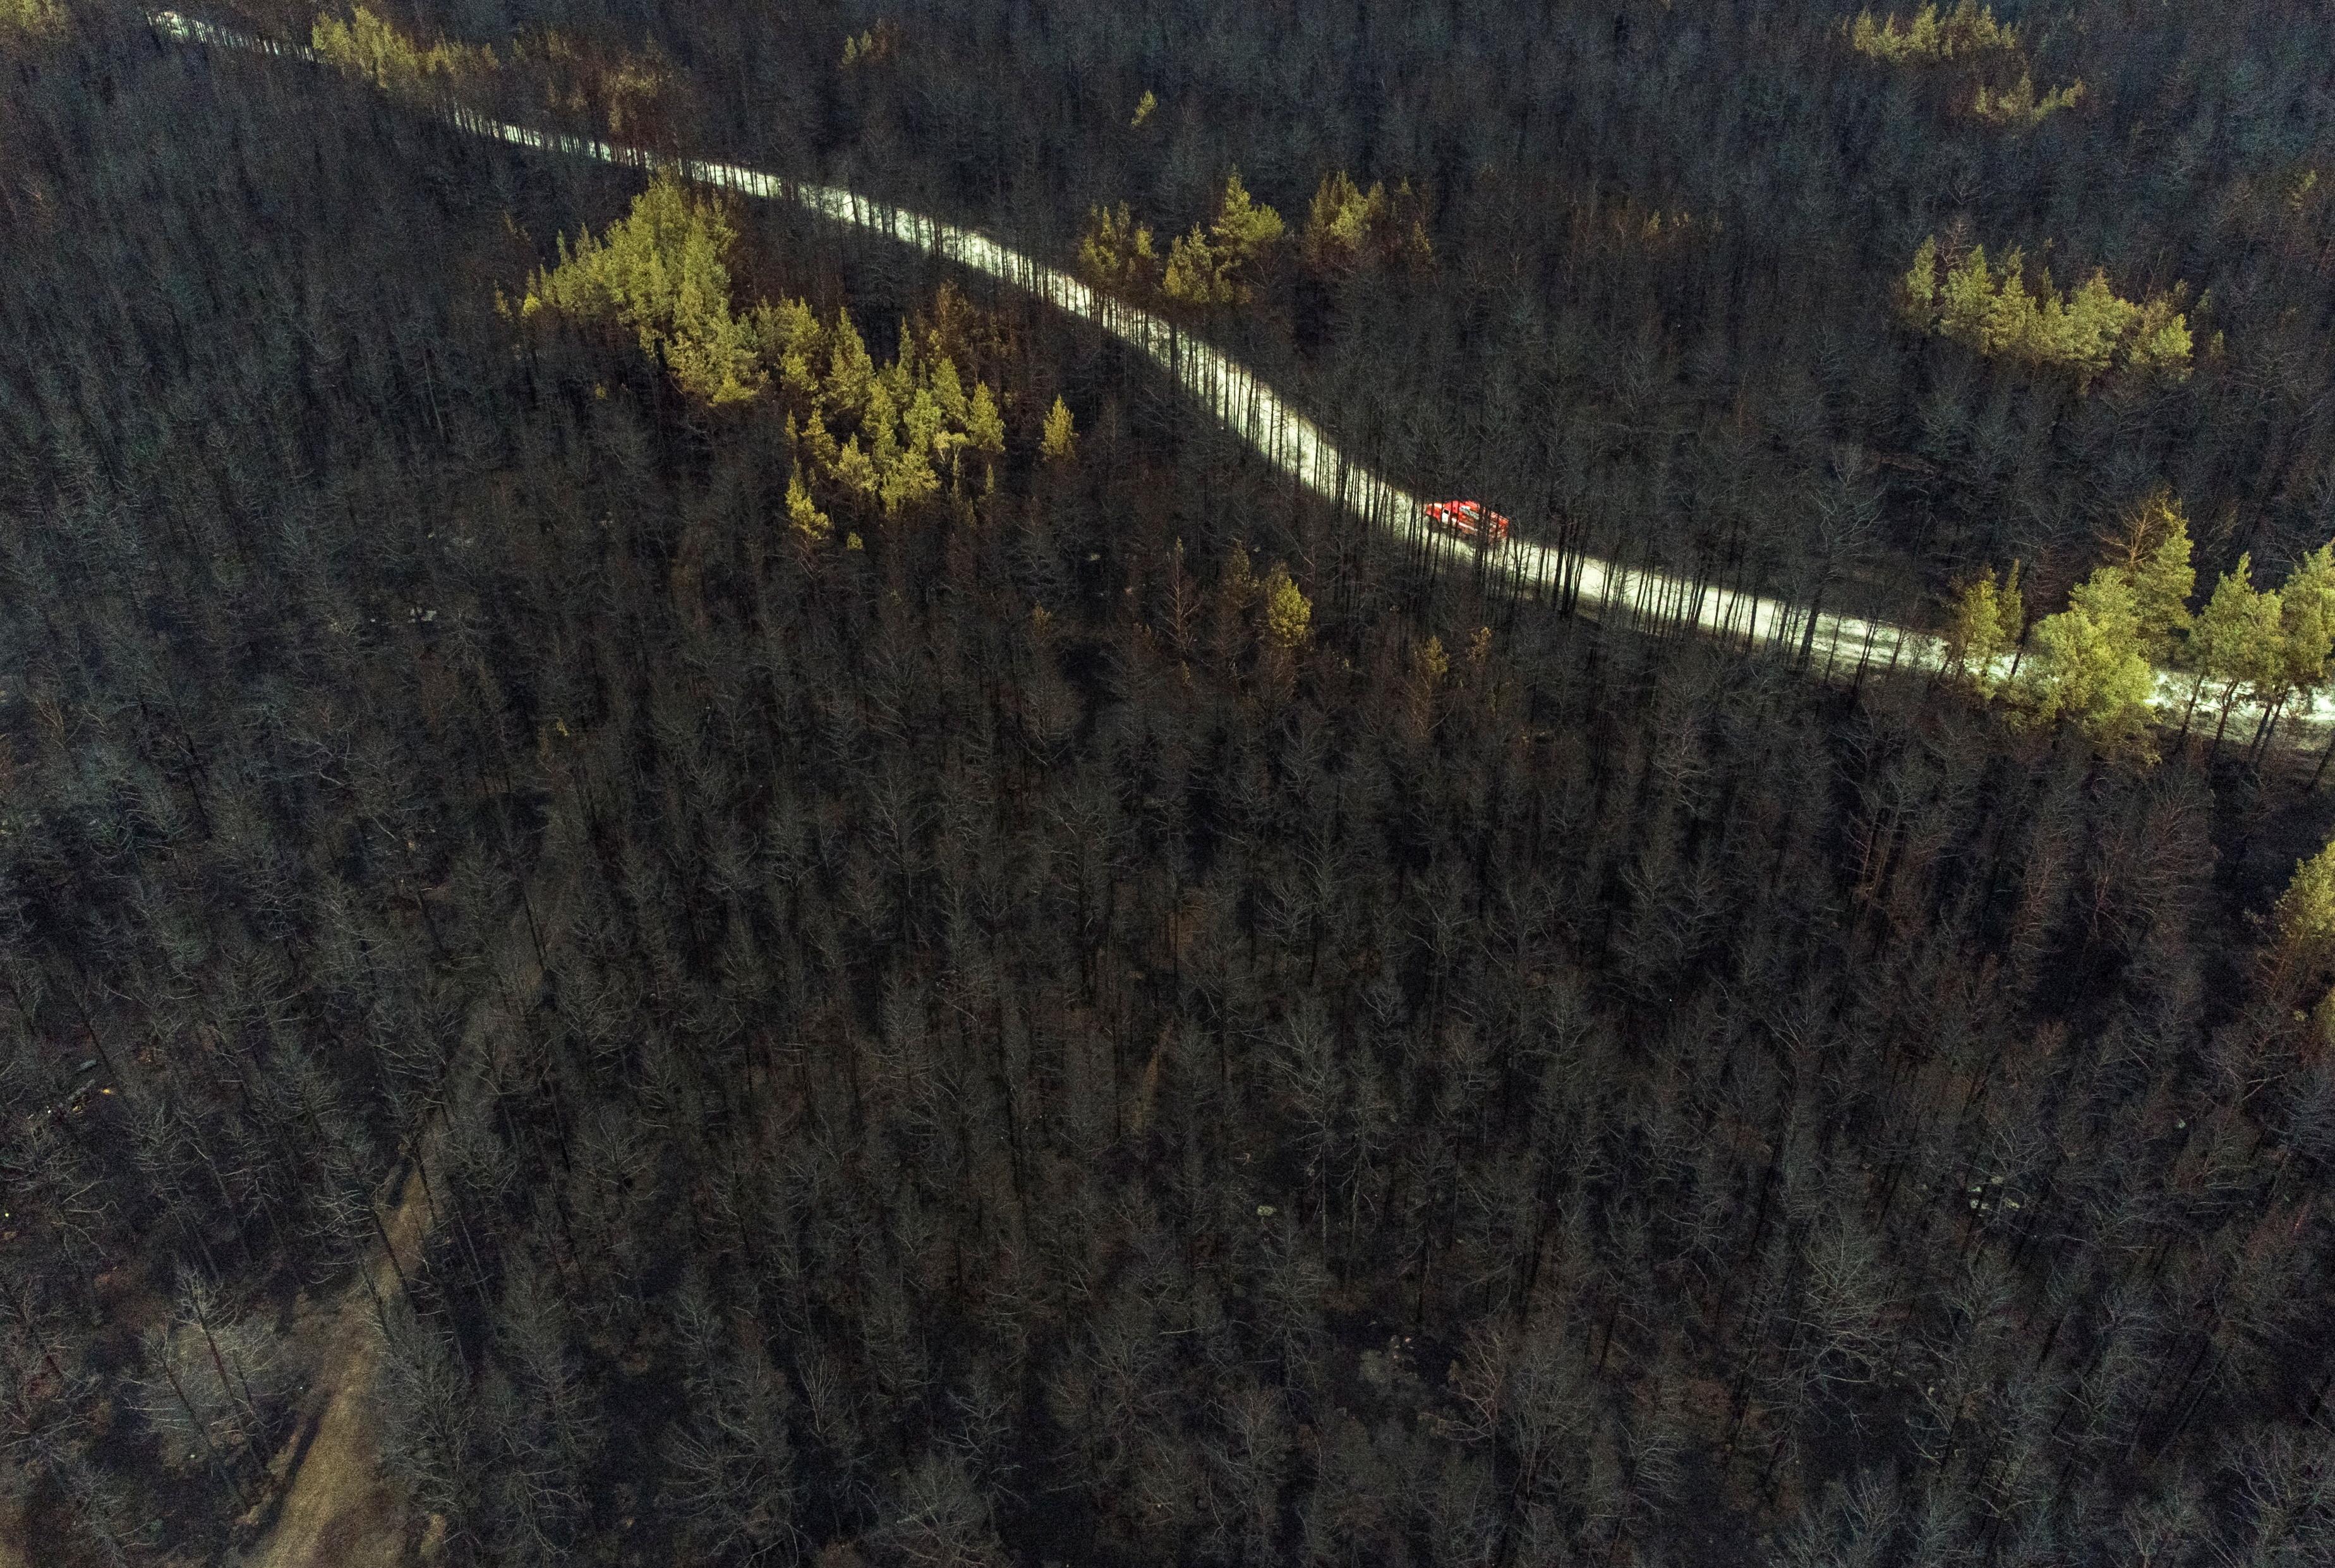 a fire truck drives across a forest burnt by wildfire towards to the sattelment of Zapasnoye in Chelyabinsk Region, Russia